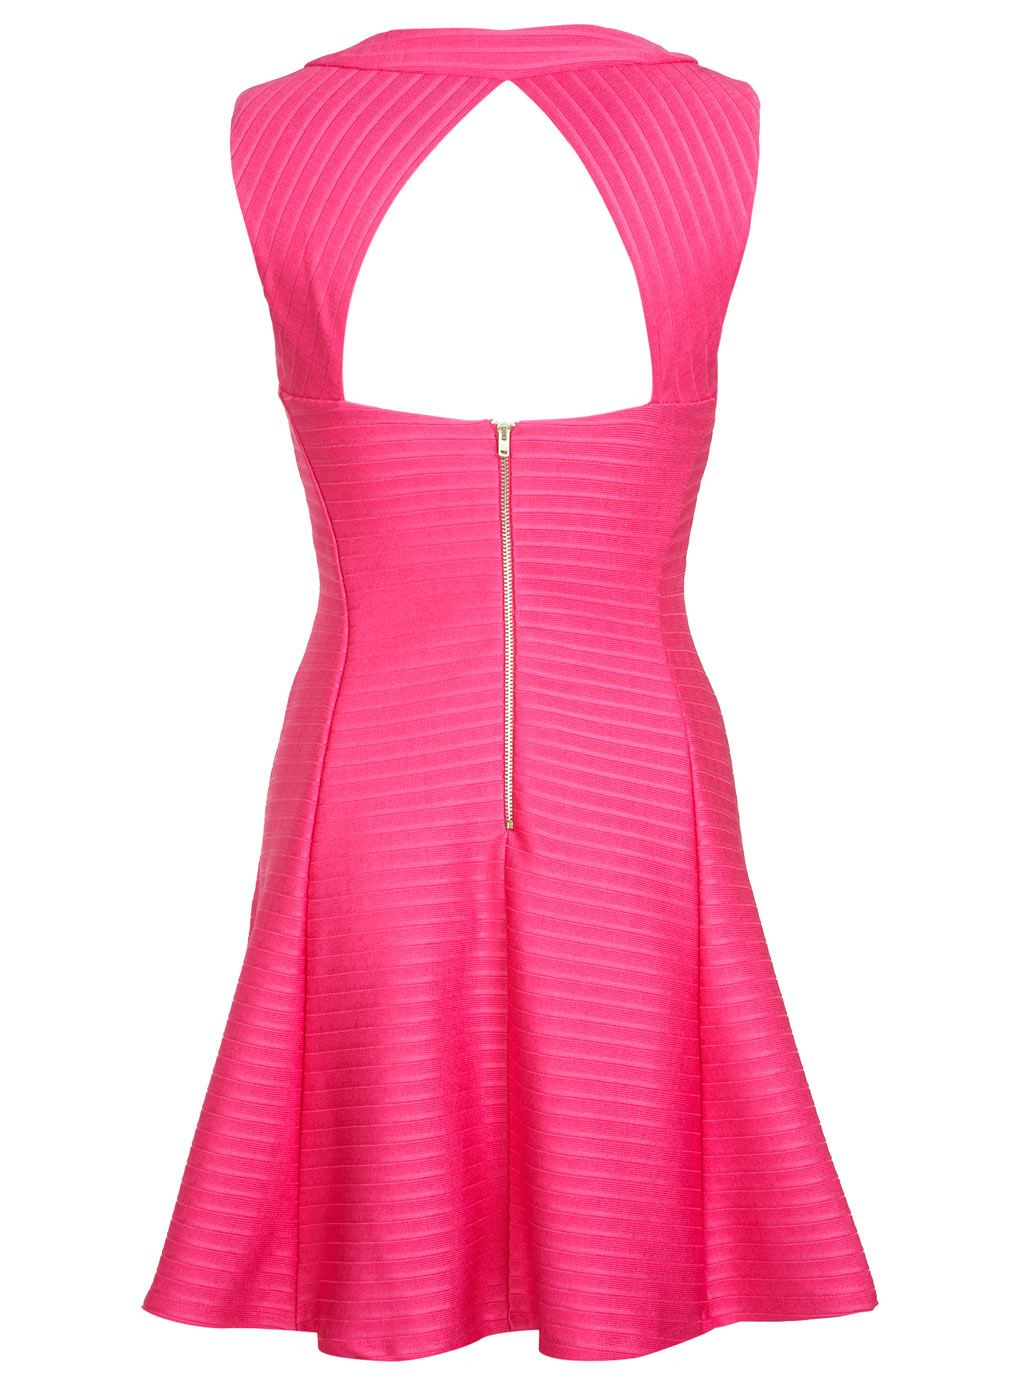 Miss Selfridge Women\'s Evening Bandage Rib Skater Dress SIZE 16 ONLY ...